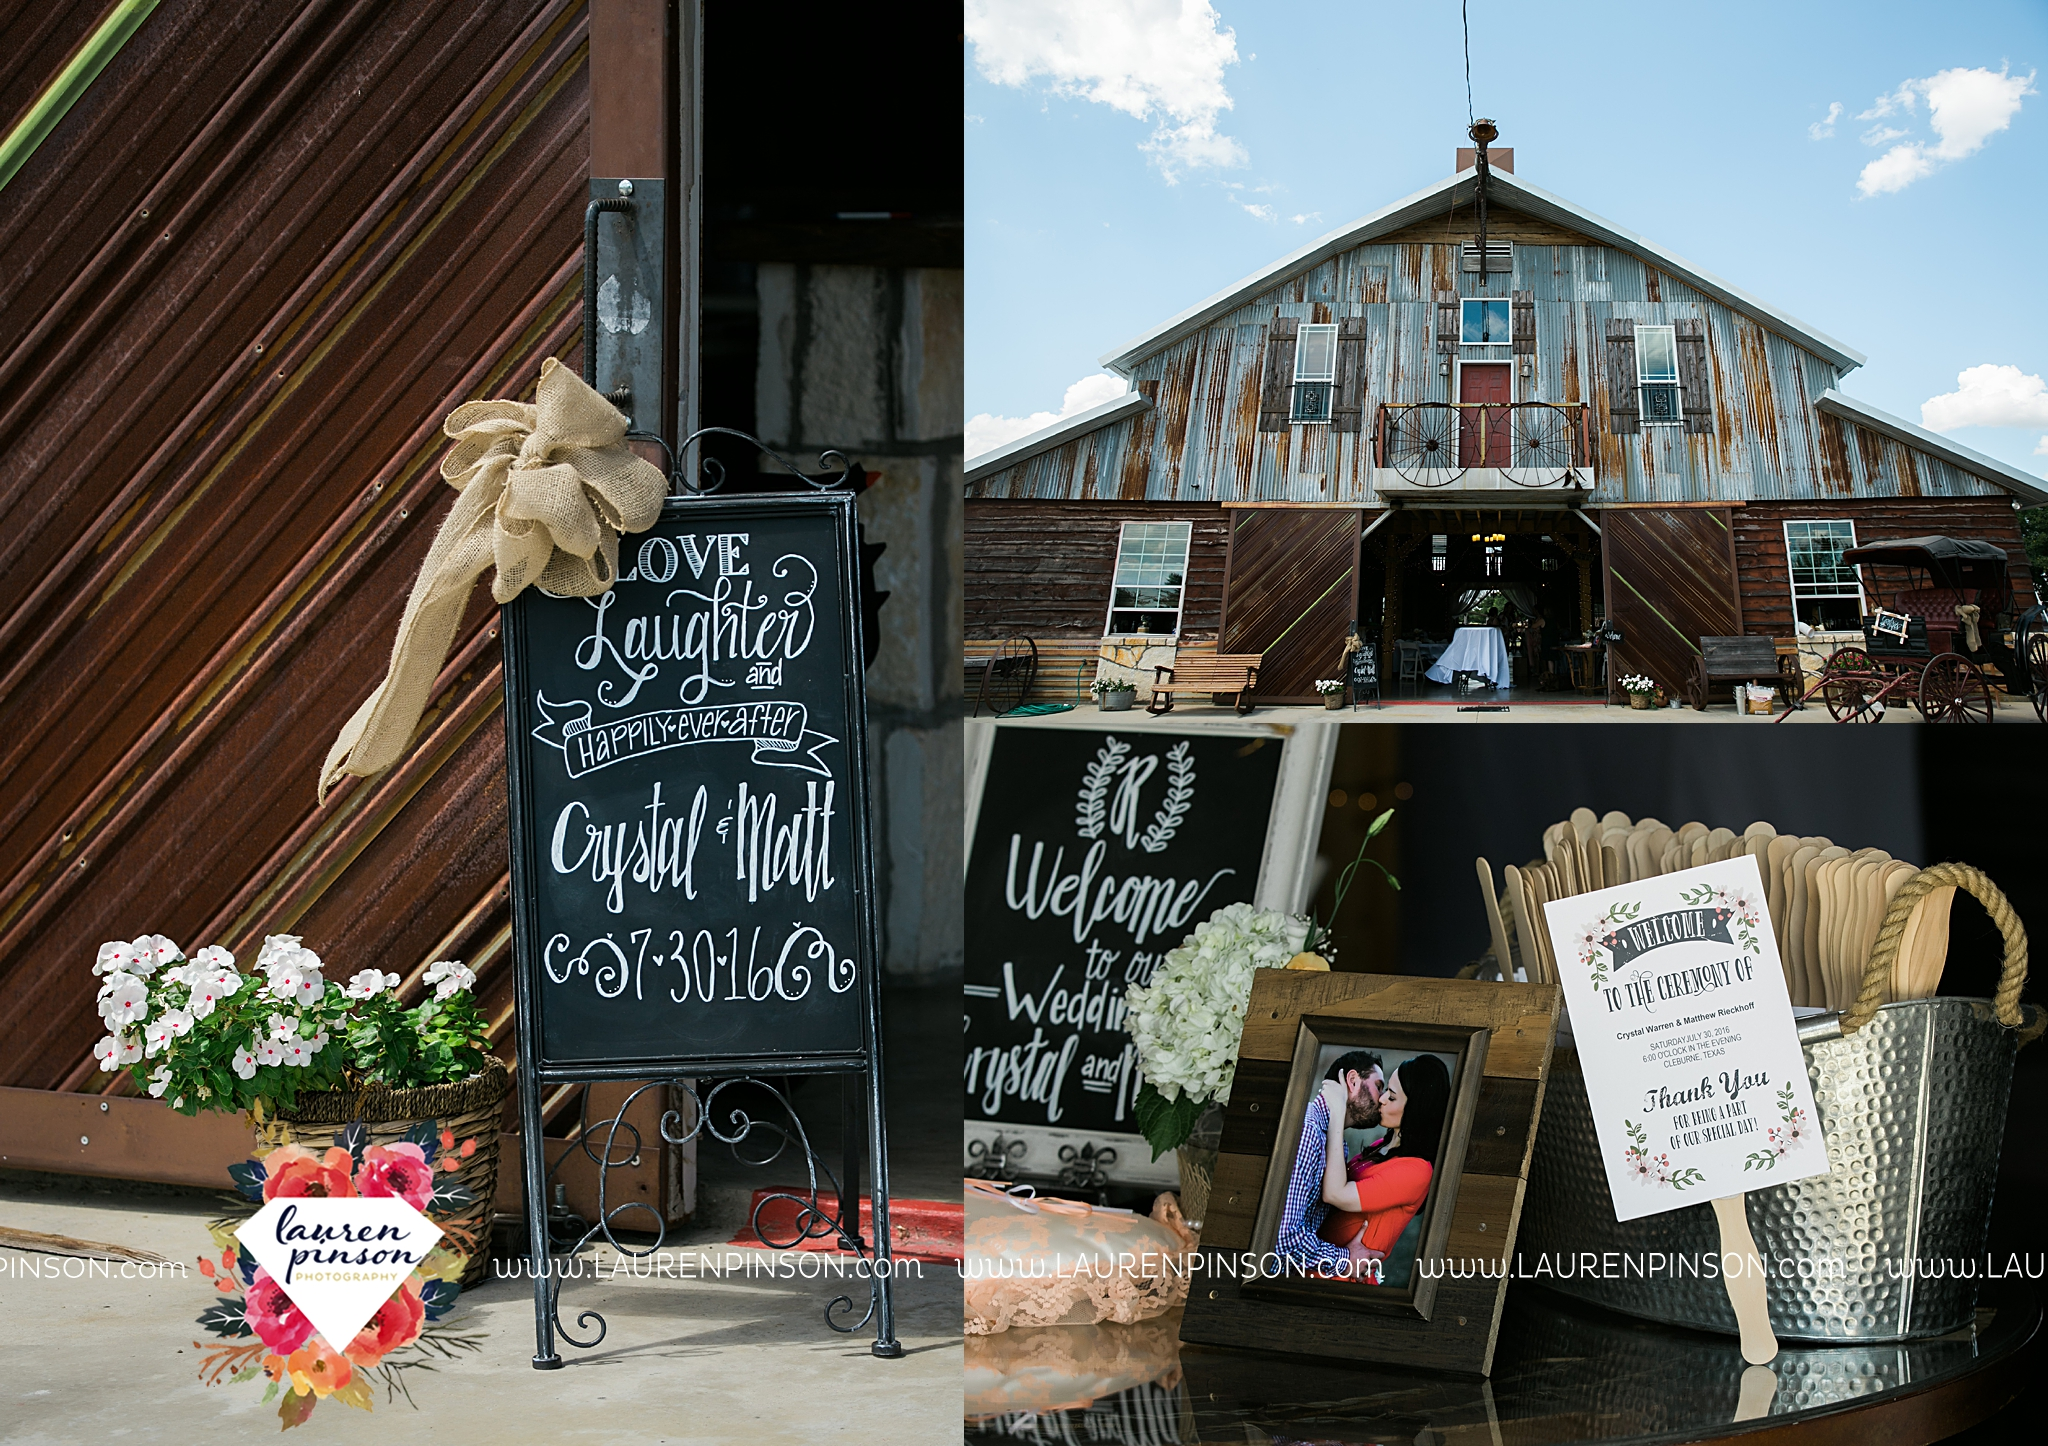 jones-barn-willow-creek-ranch-wedding-in-cleburne-texas-fort-worth-dfw-wichita-falls-wedding-photography_3232.jpg